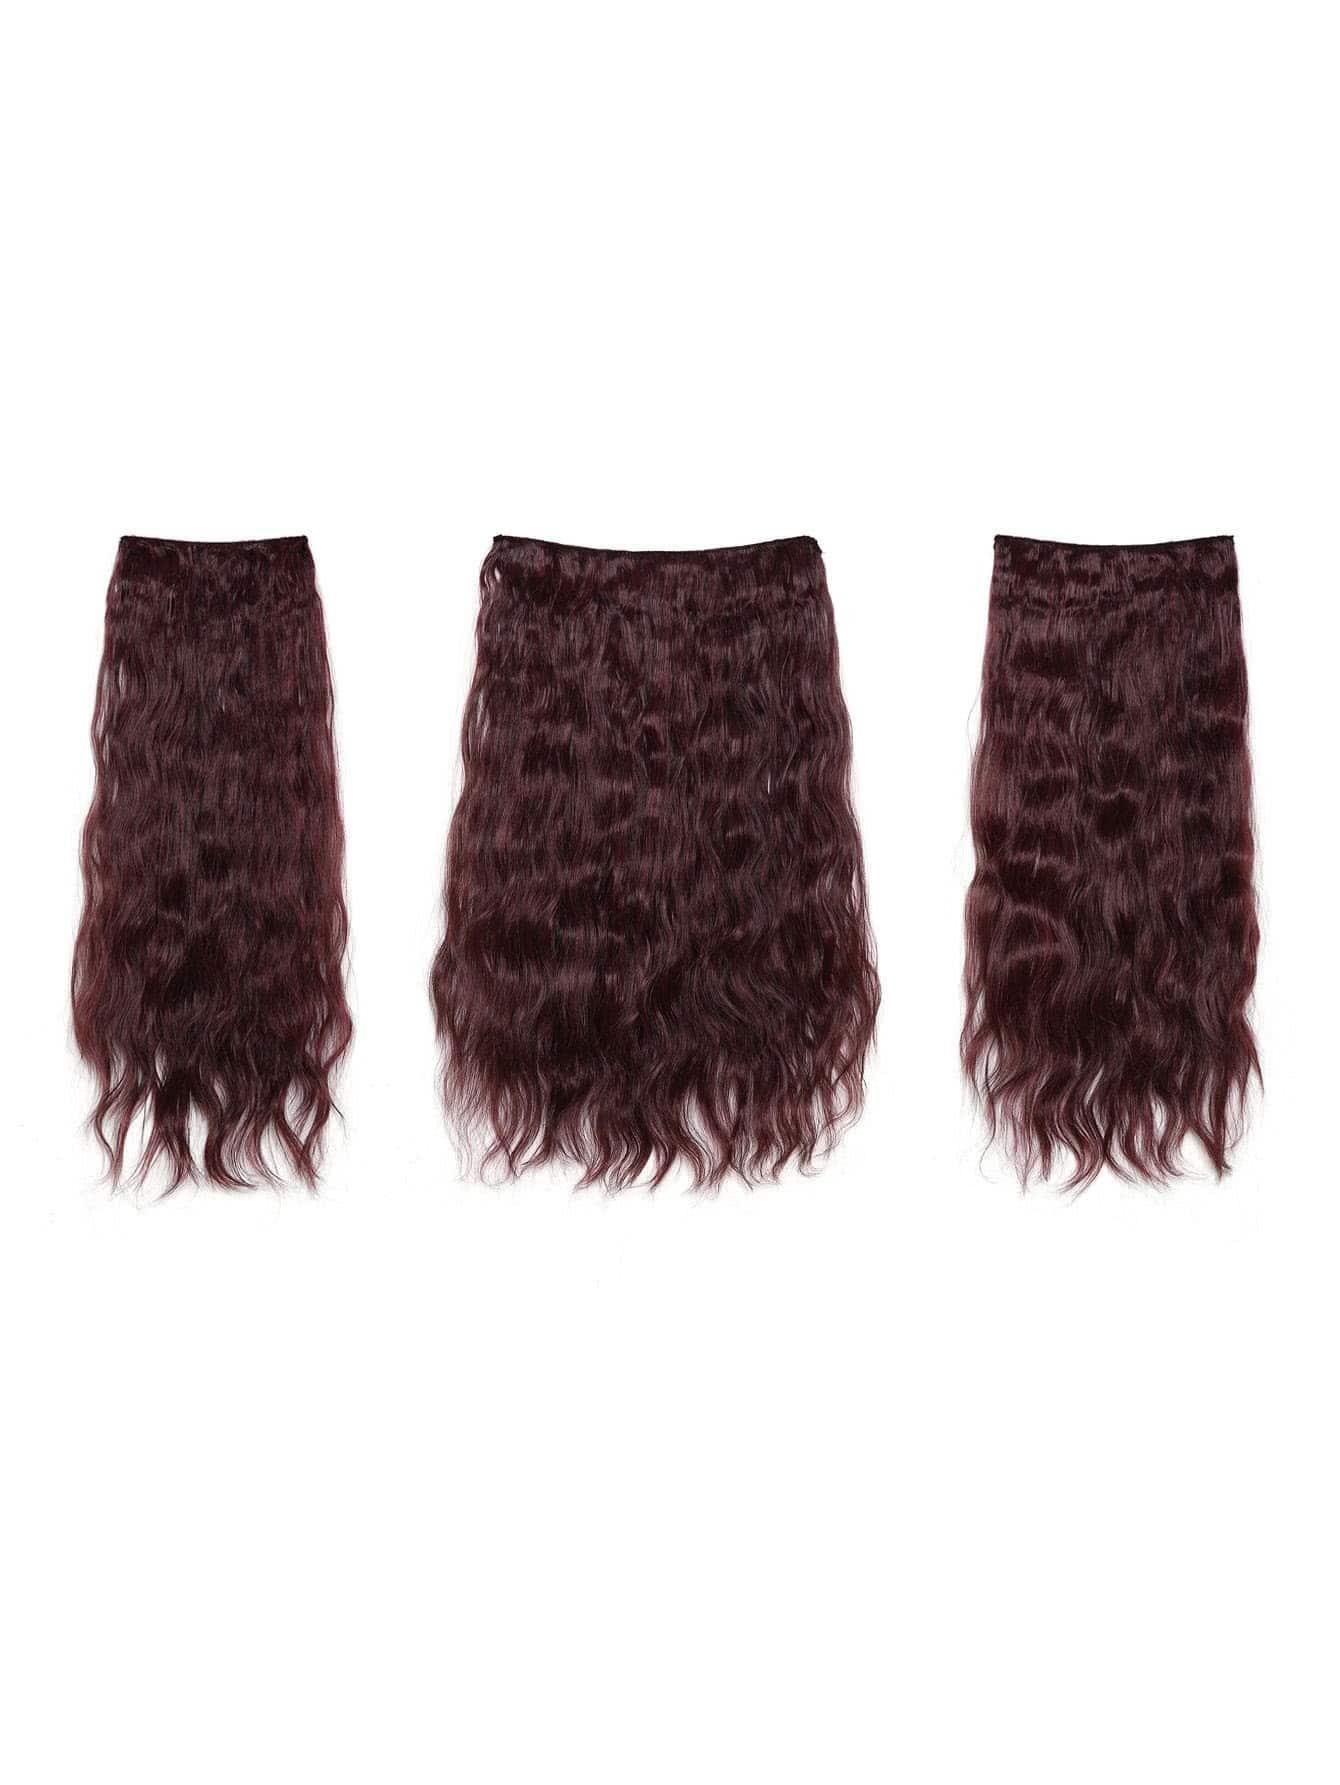 цена на Black & Burgundy Clip In Curly Hair Extension 3pcs